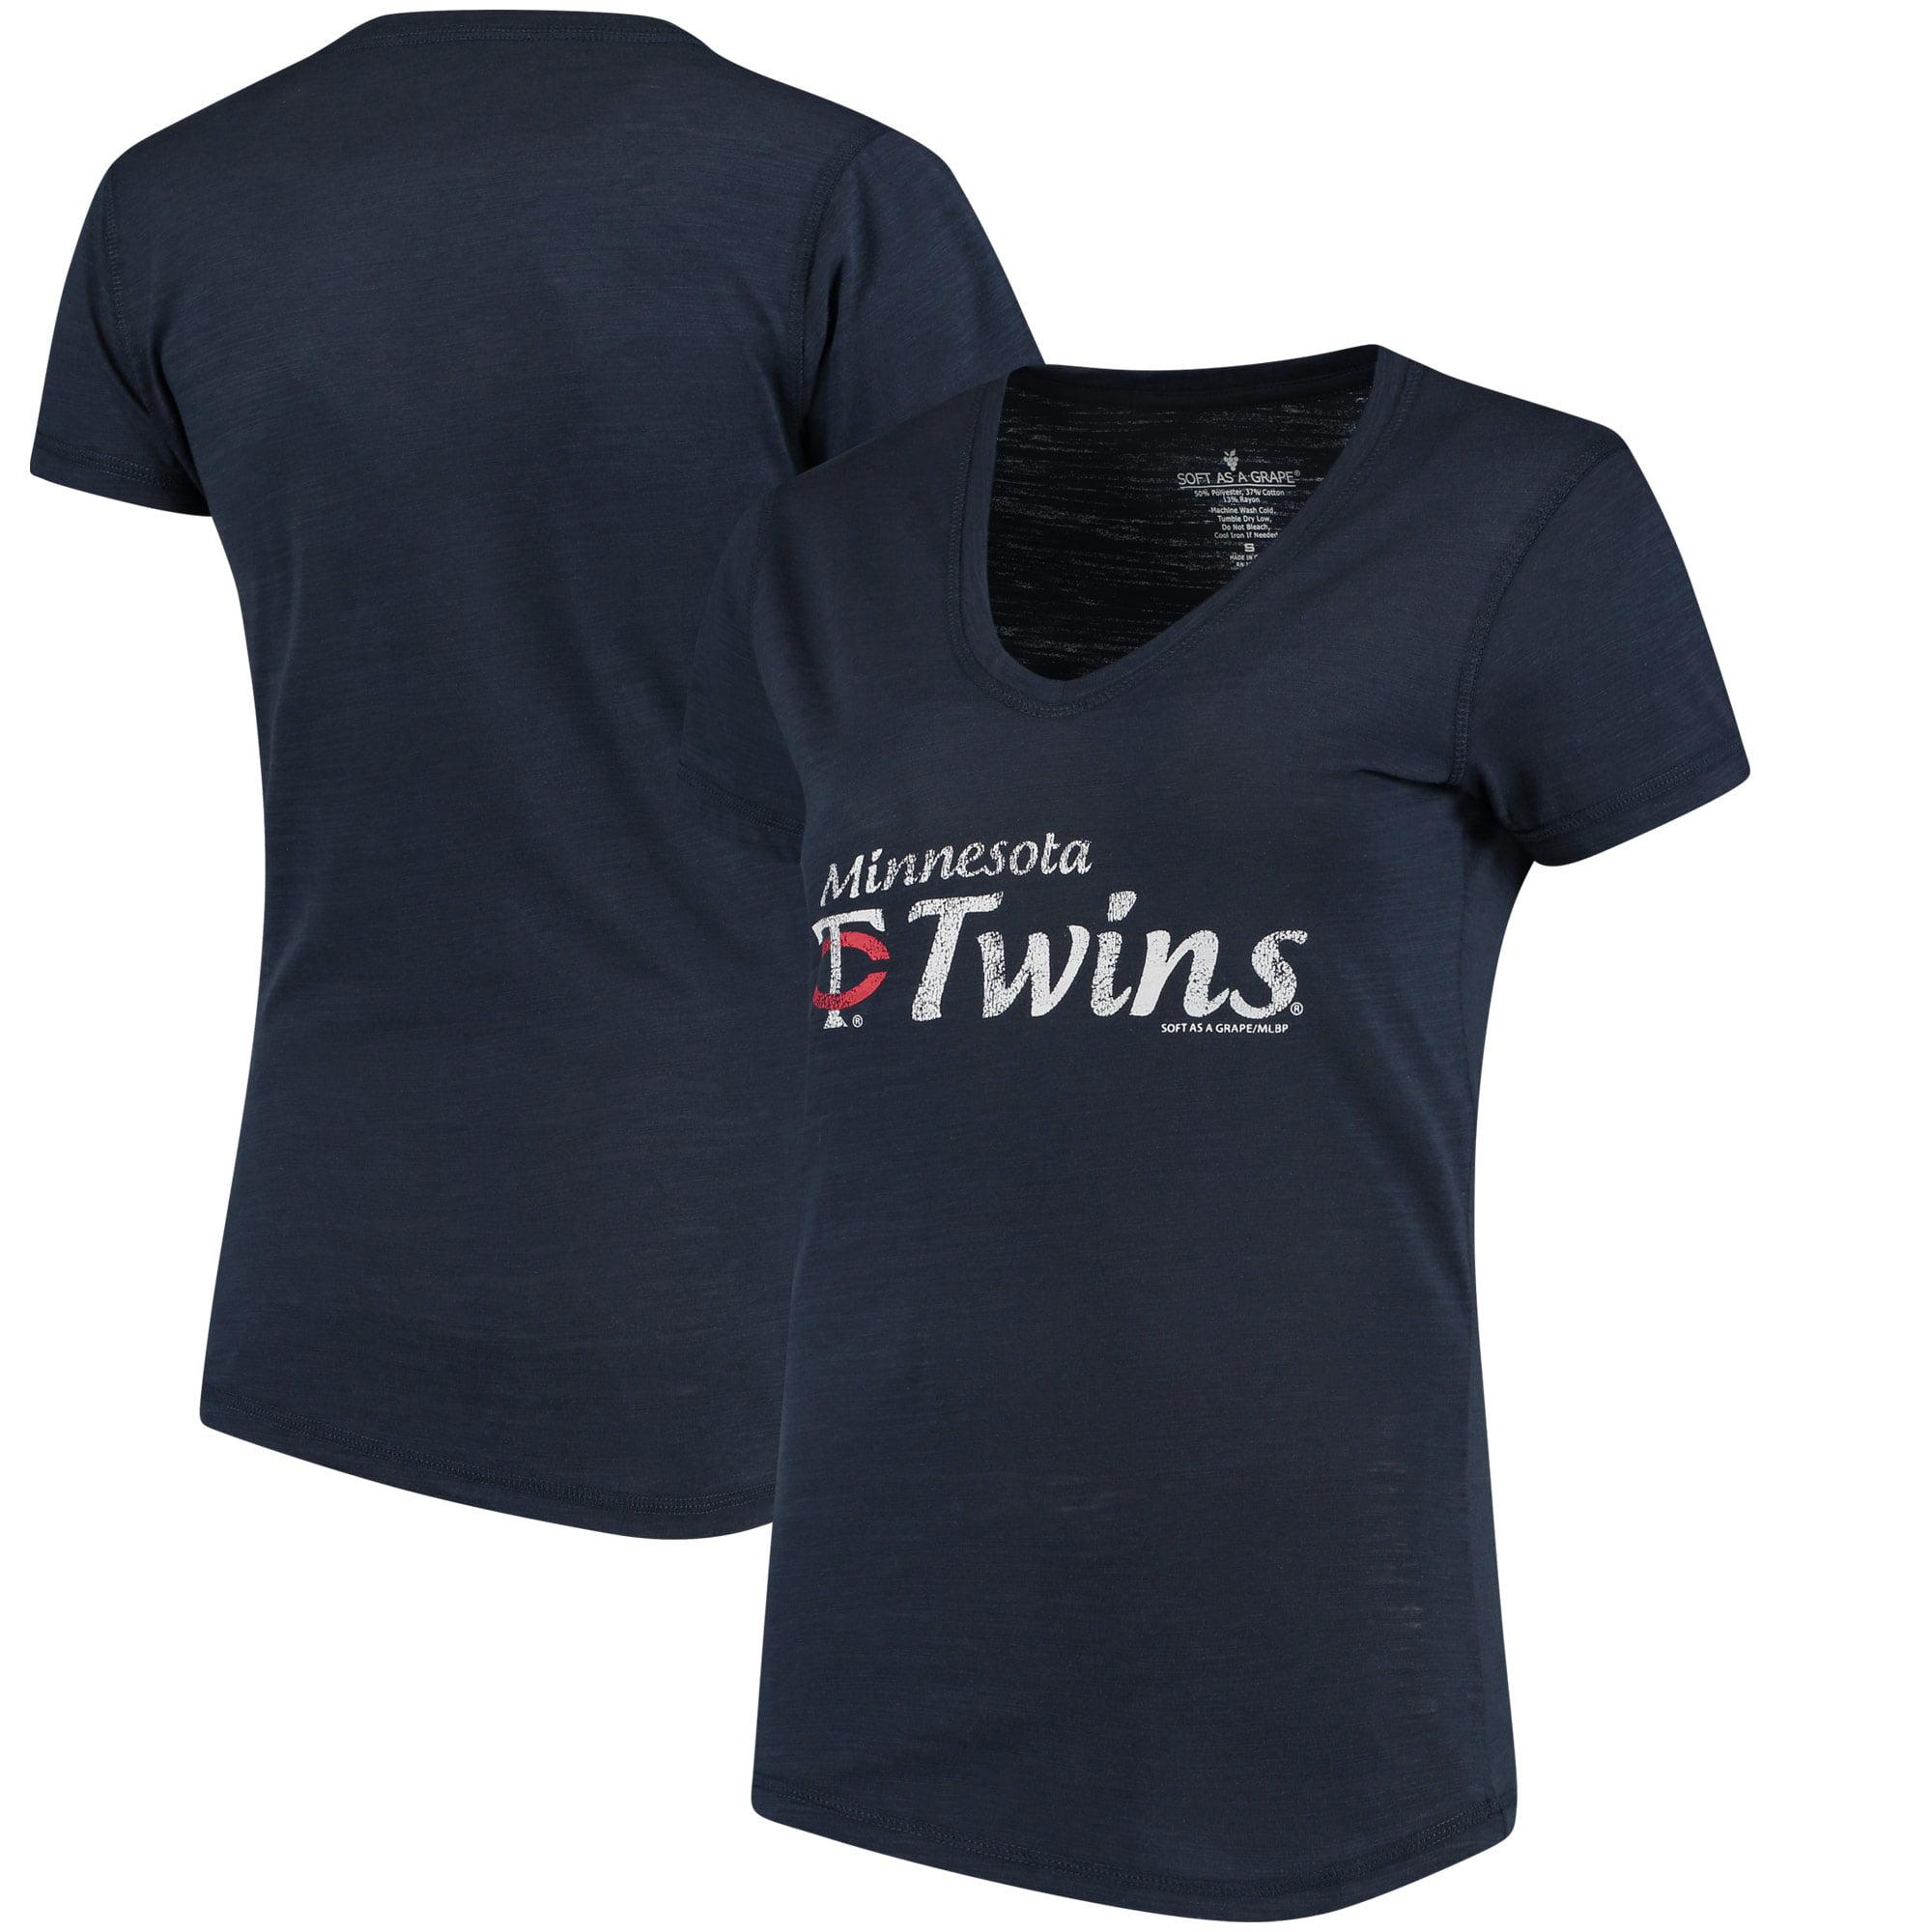 Minnesota Twins Soft As A Grape Women's Double Steal Tri-Blend V-Neck T-Shirt - Navy